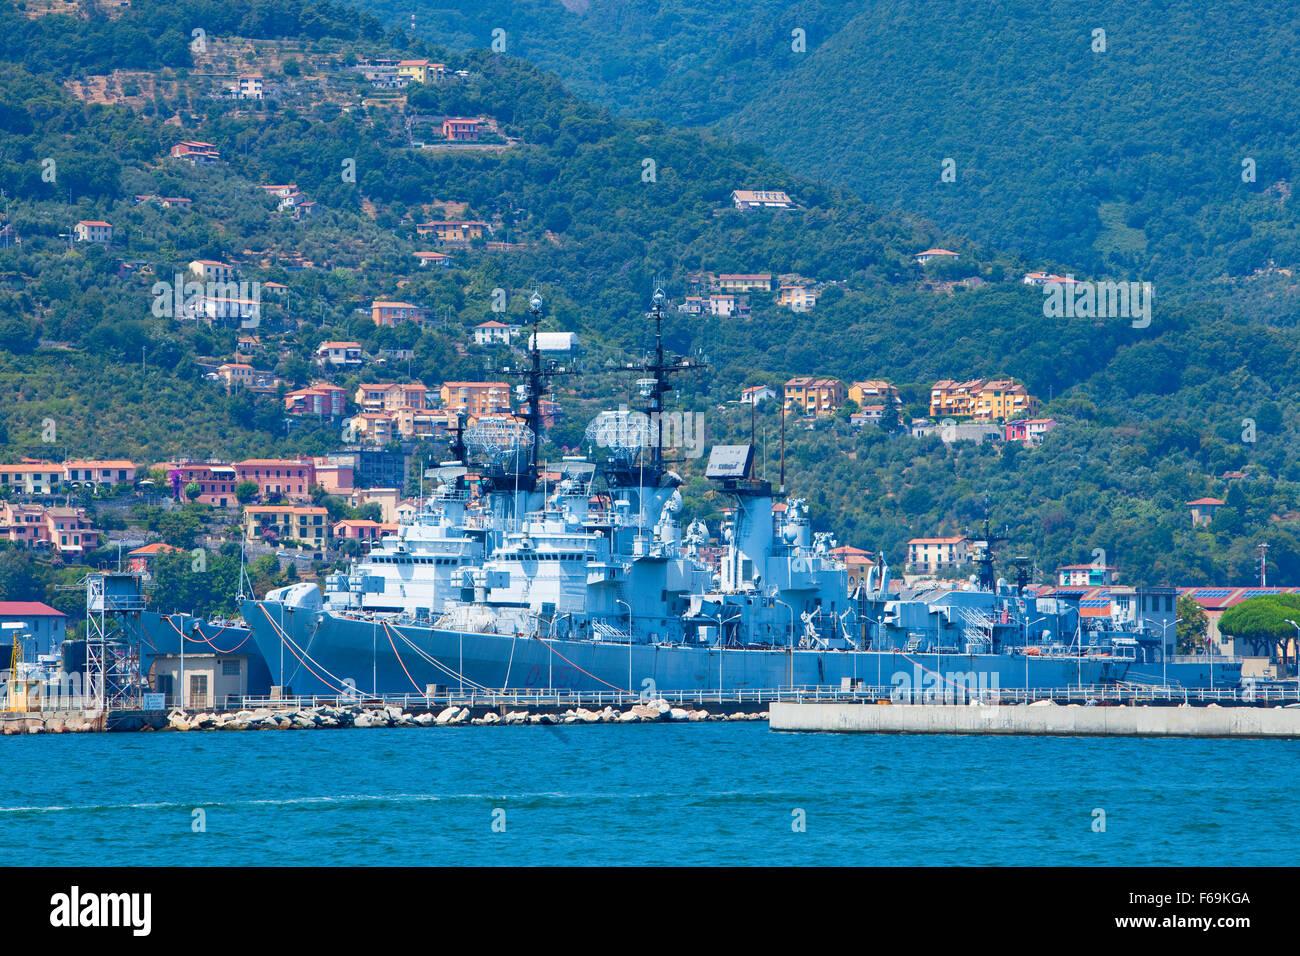 Italy, Liguria - Italy Navy Ship in Port of La Spezia. - Stock Image